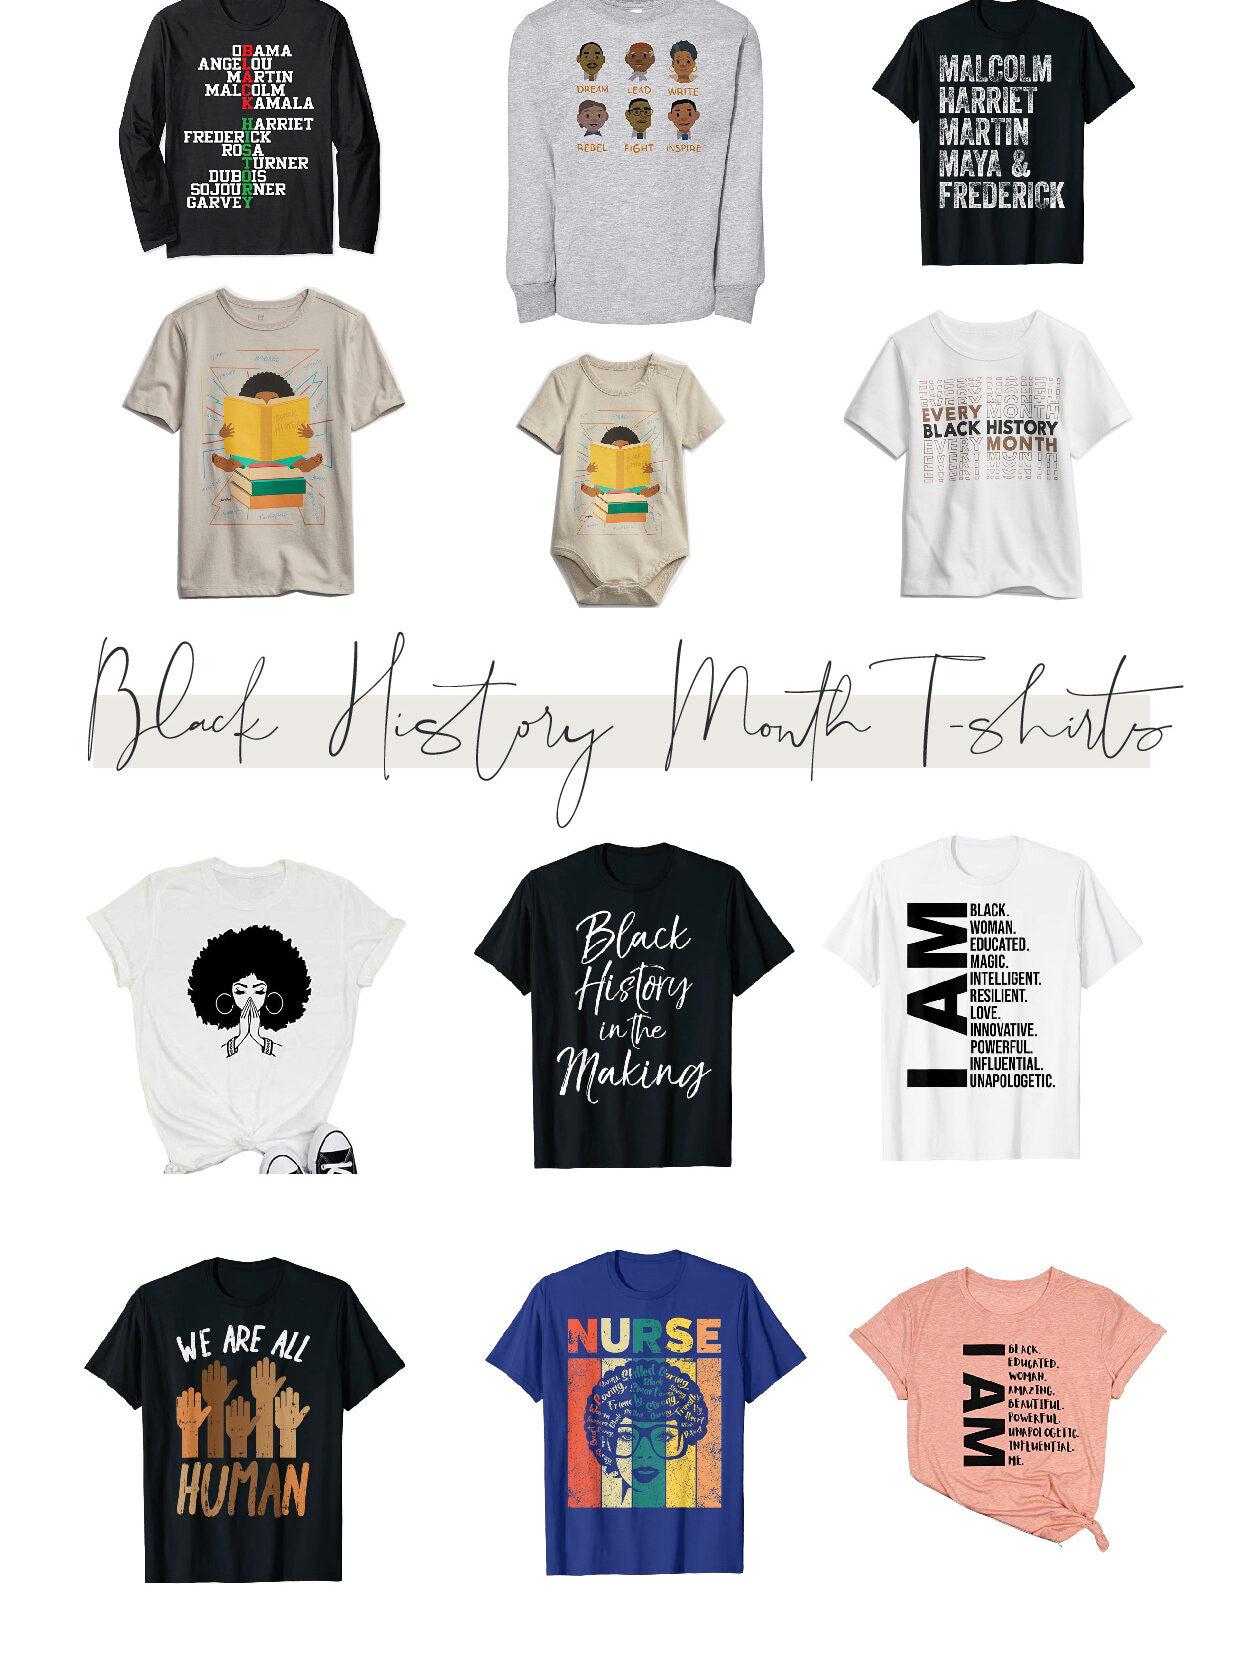 black history month pride t-shirts